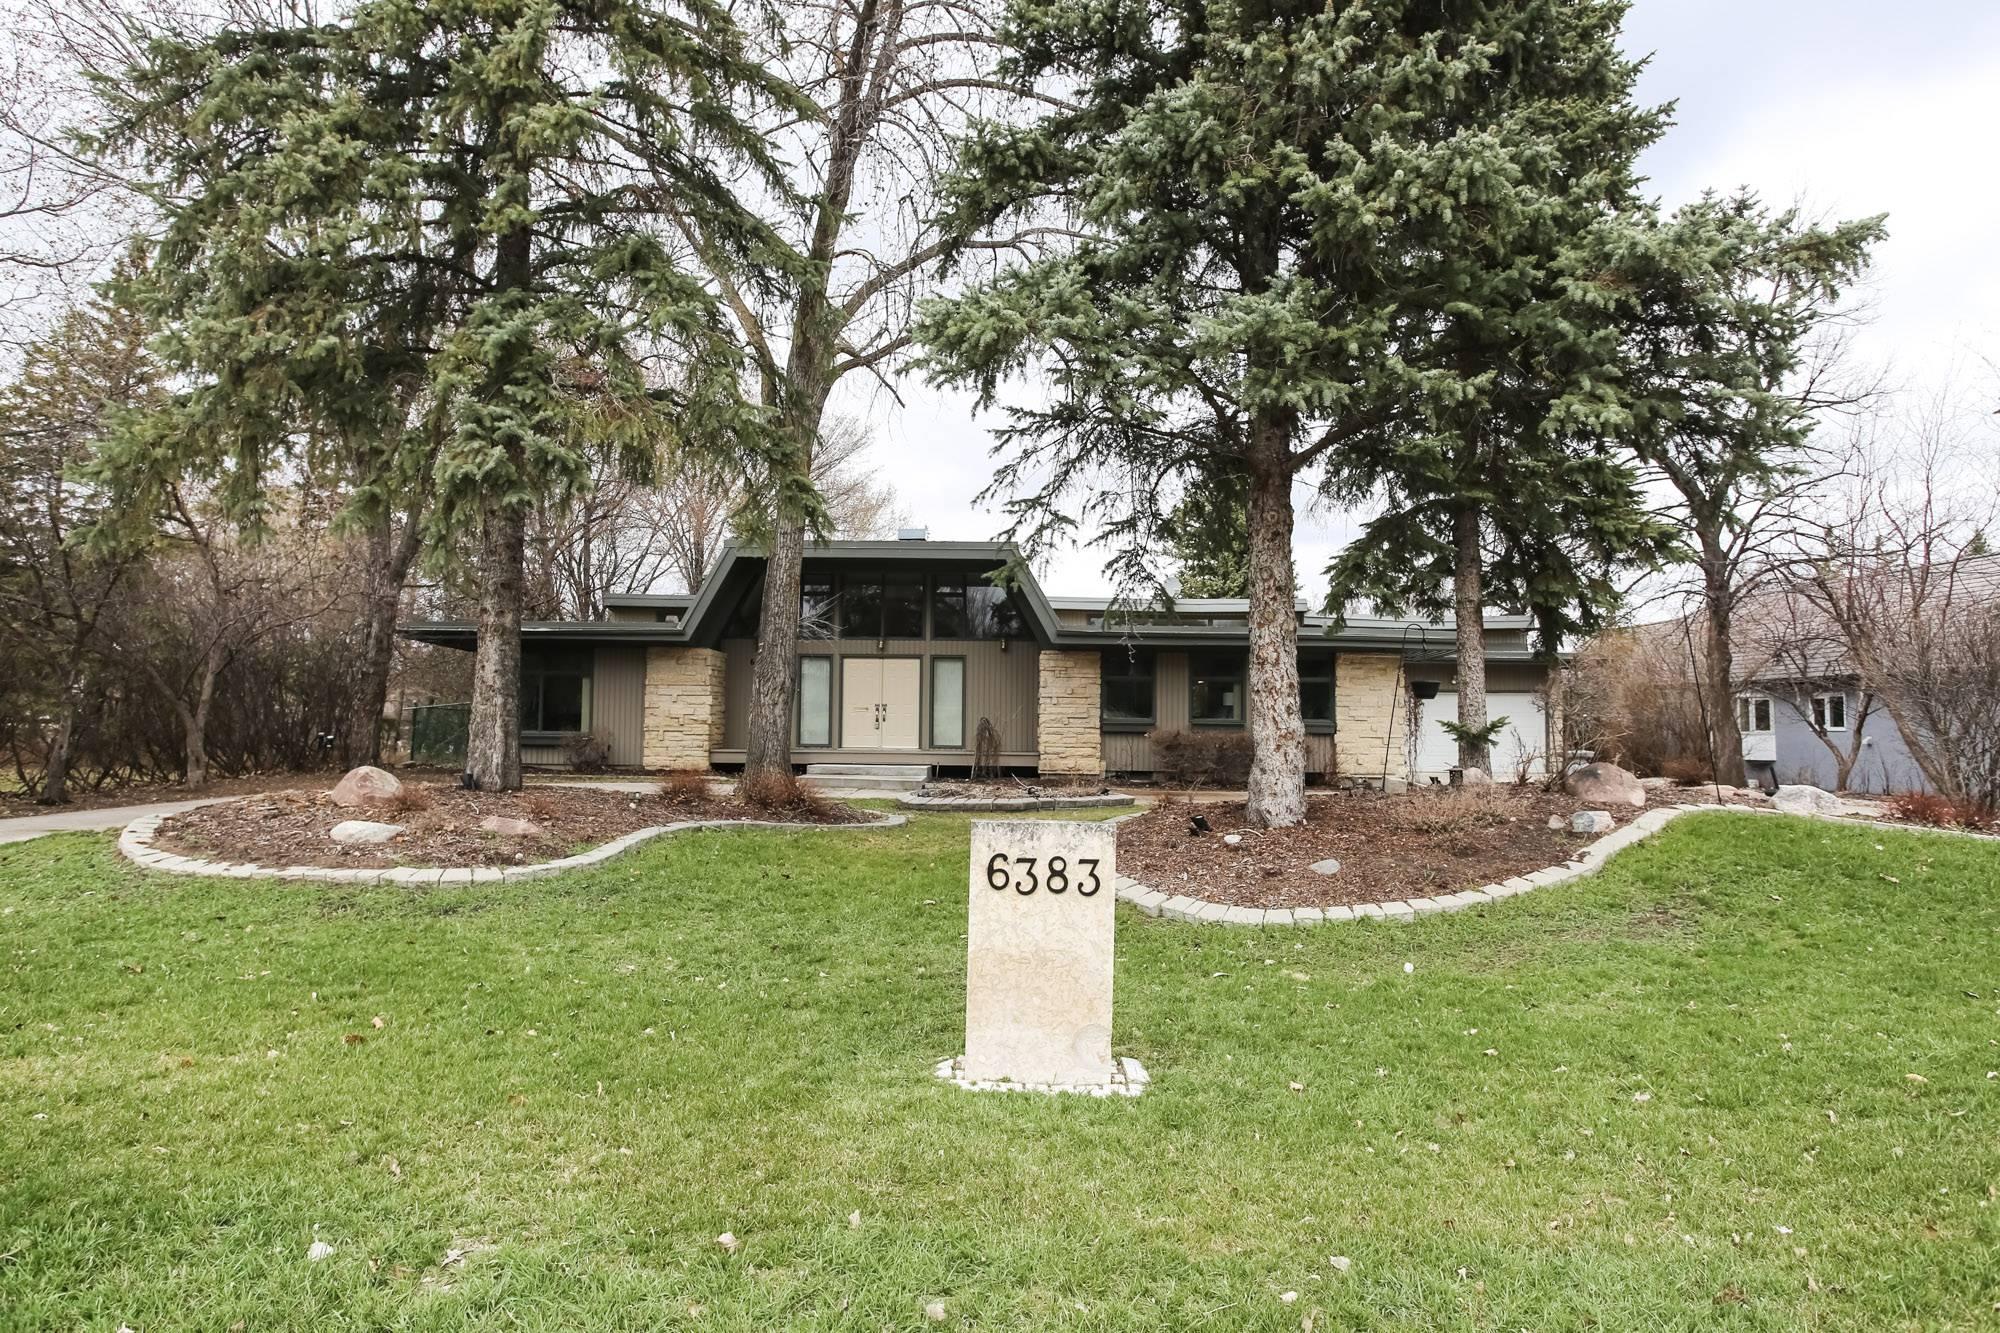 6383 Southboine Dr, Winnipeg, Manitoba  R3R 0B7 - Photo 39 - 1910748